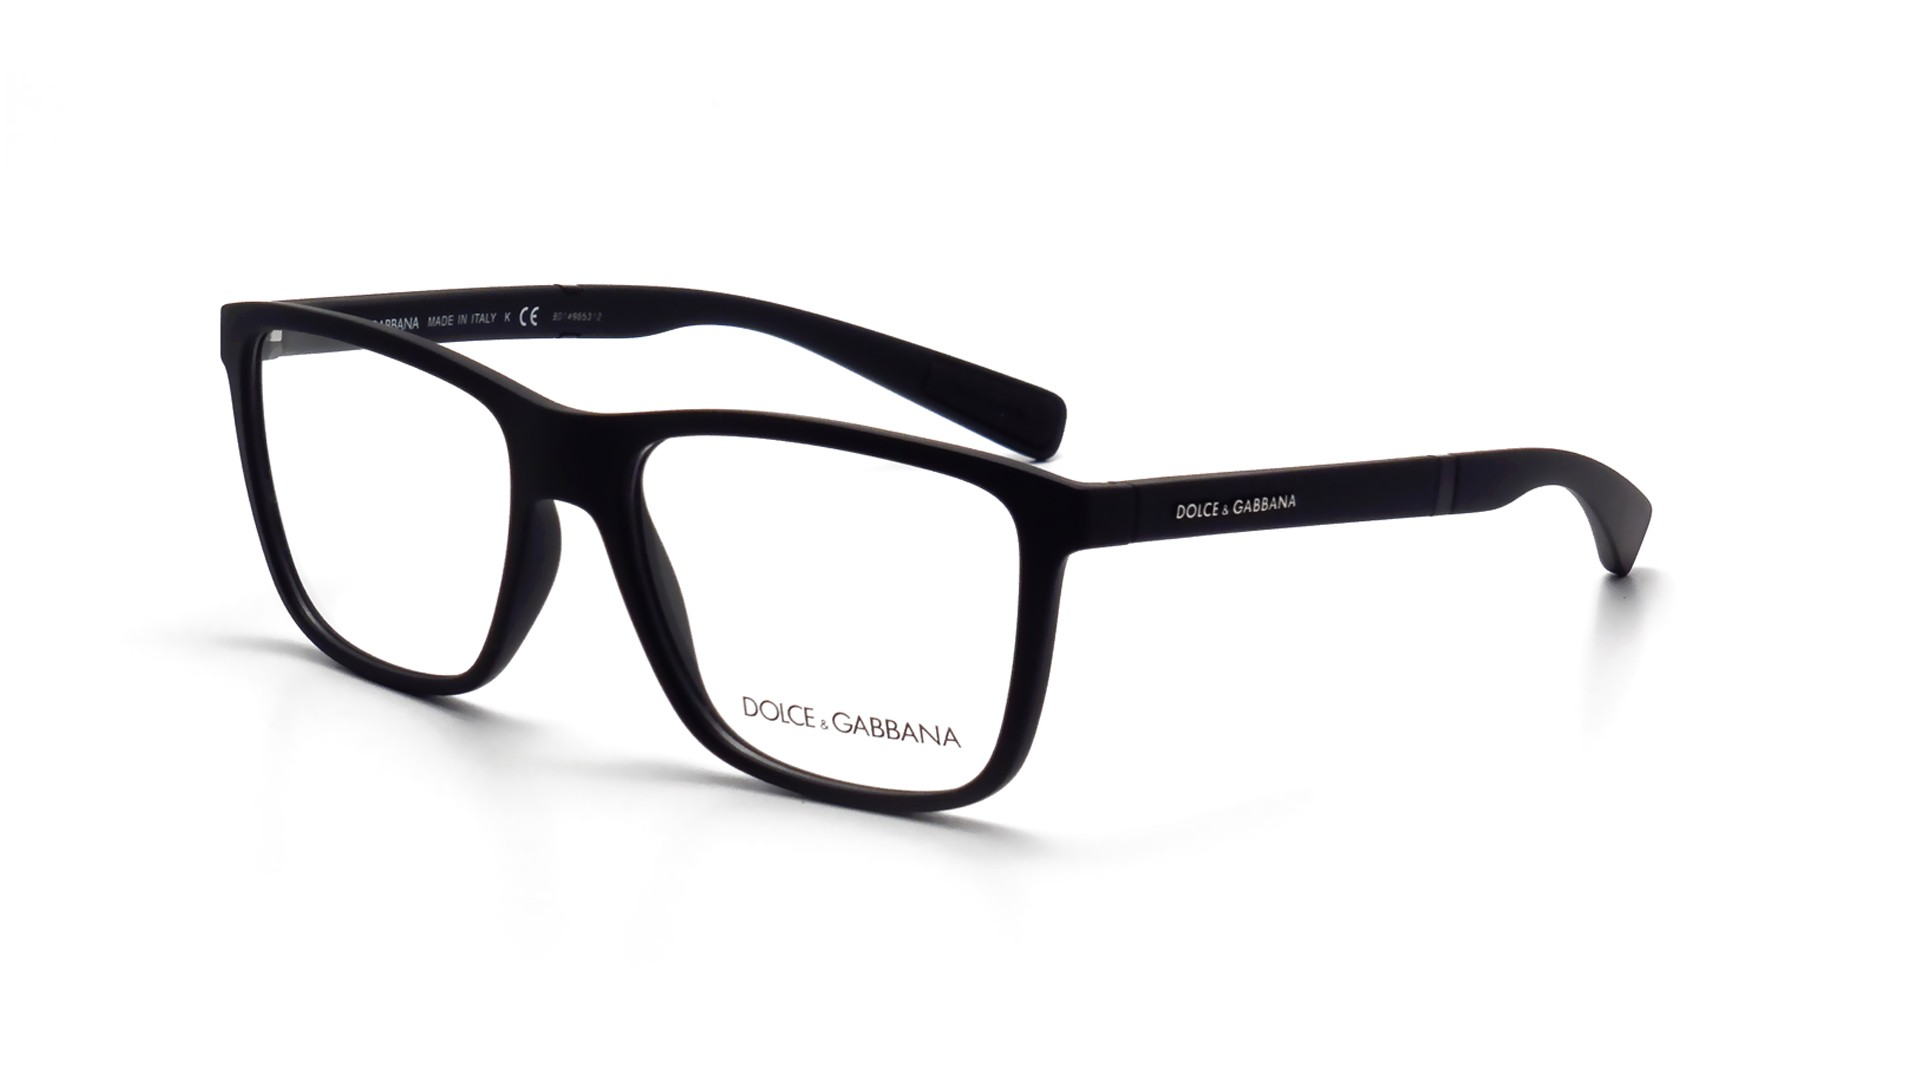 Eyeglasses Dolce & Gabbana DG5016 2616 52-16 Black Matte Medium